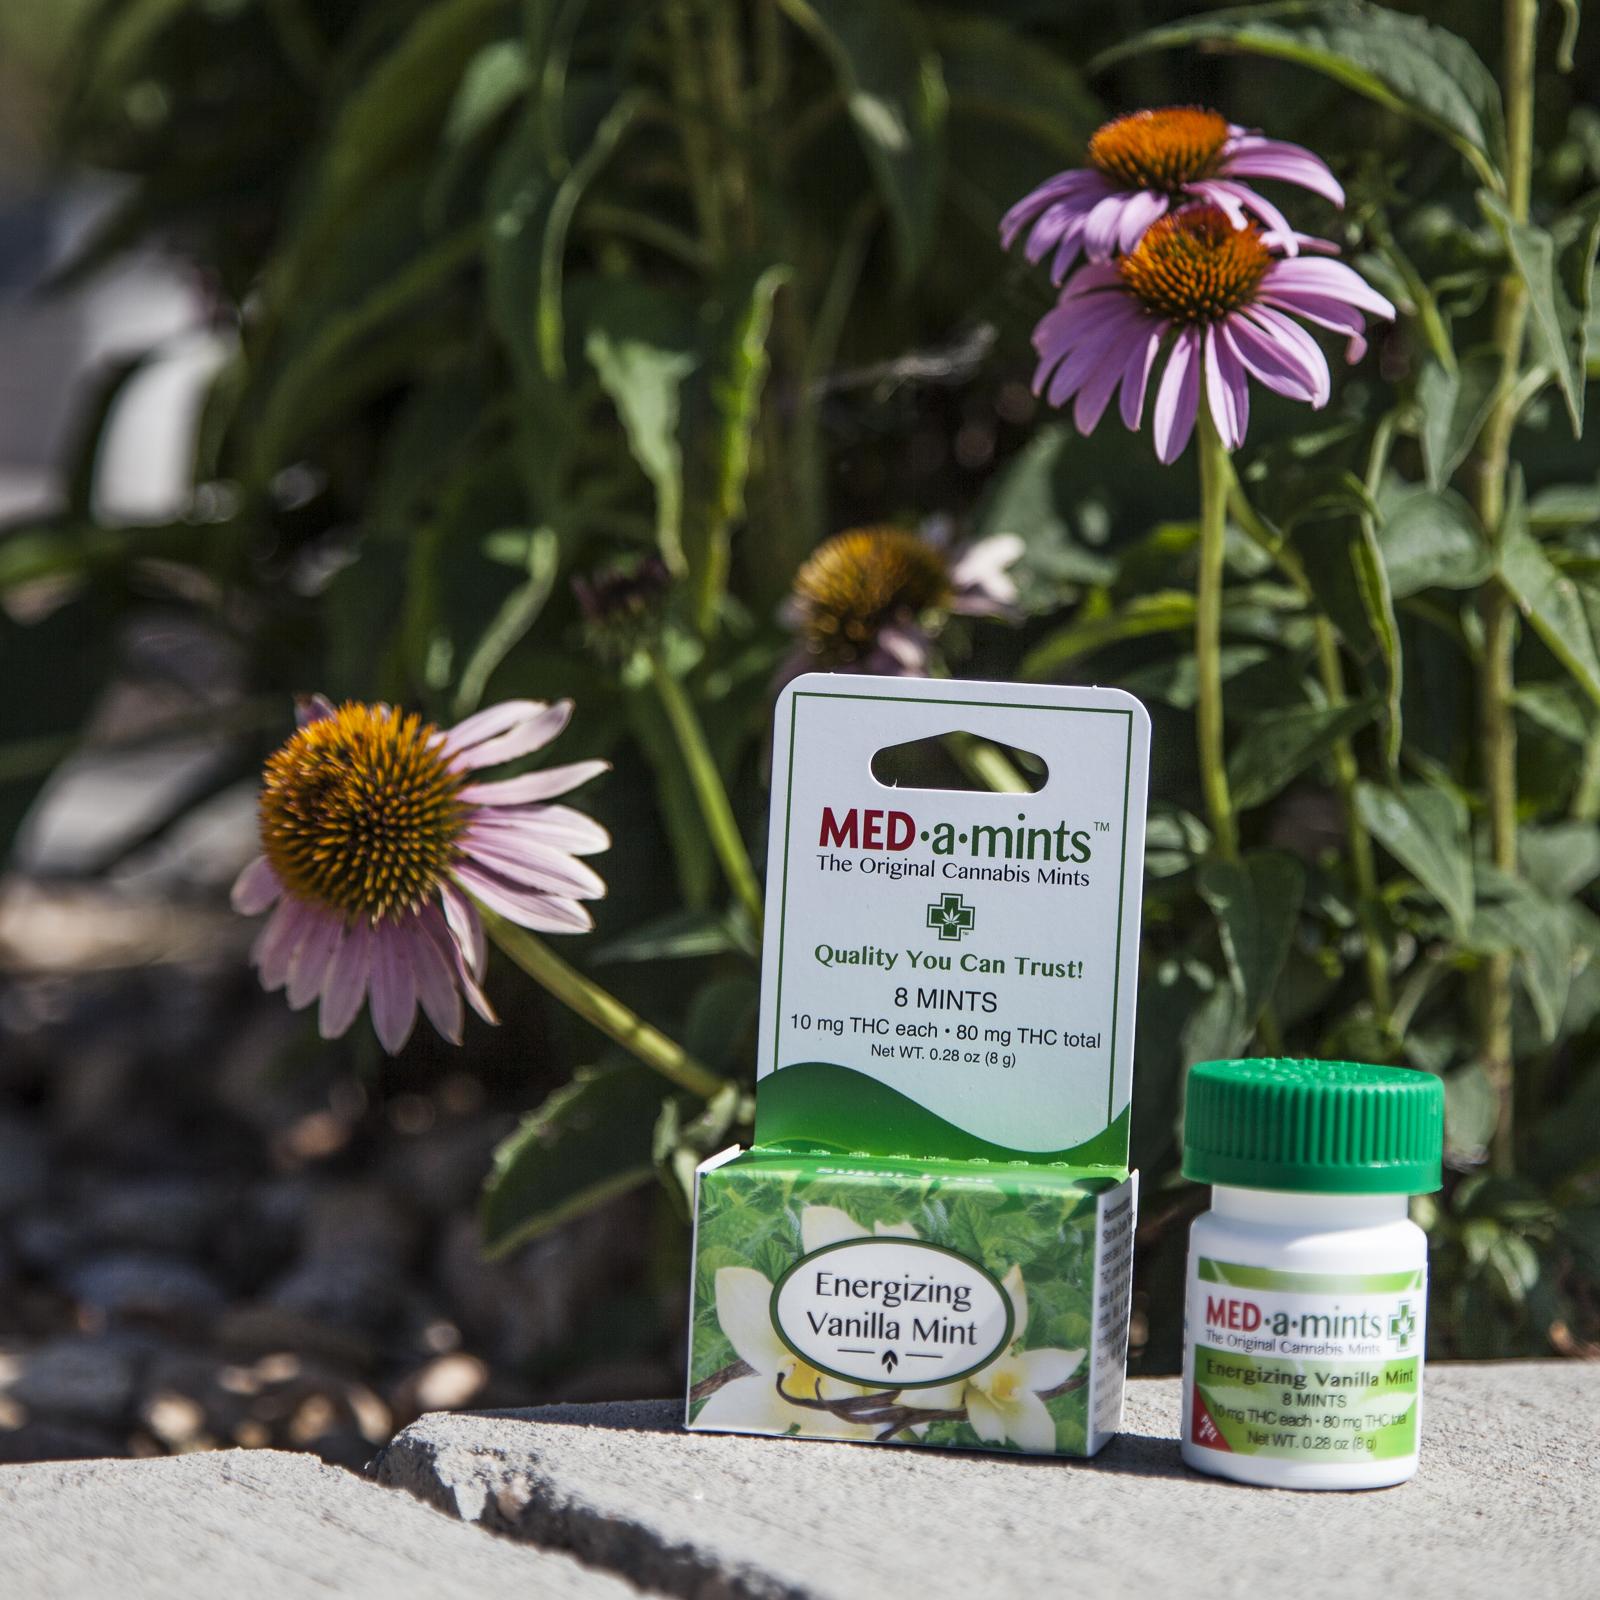 medamints-potent-thc-cannabis-marijuana-mints-008